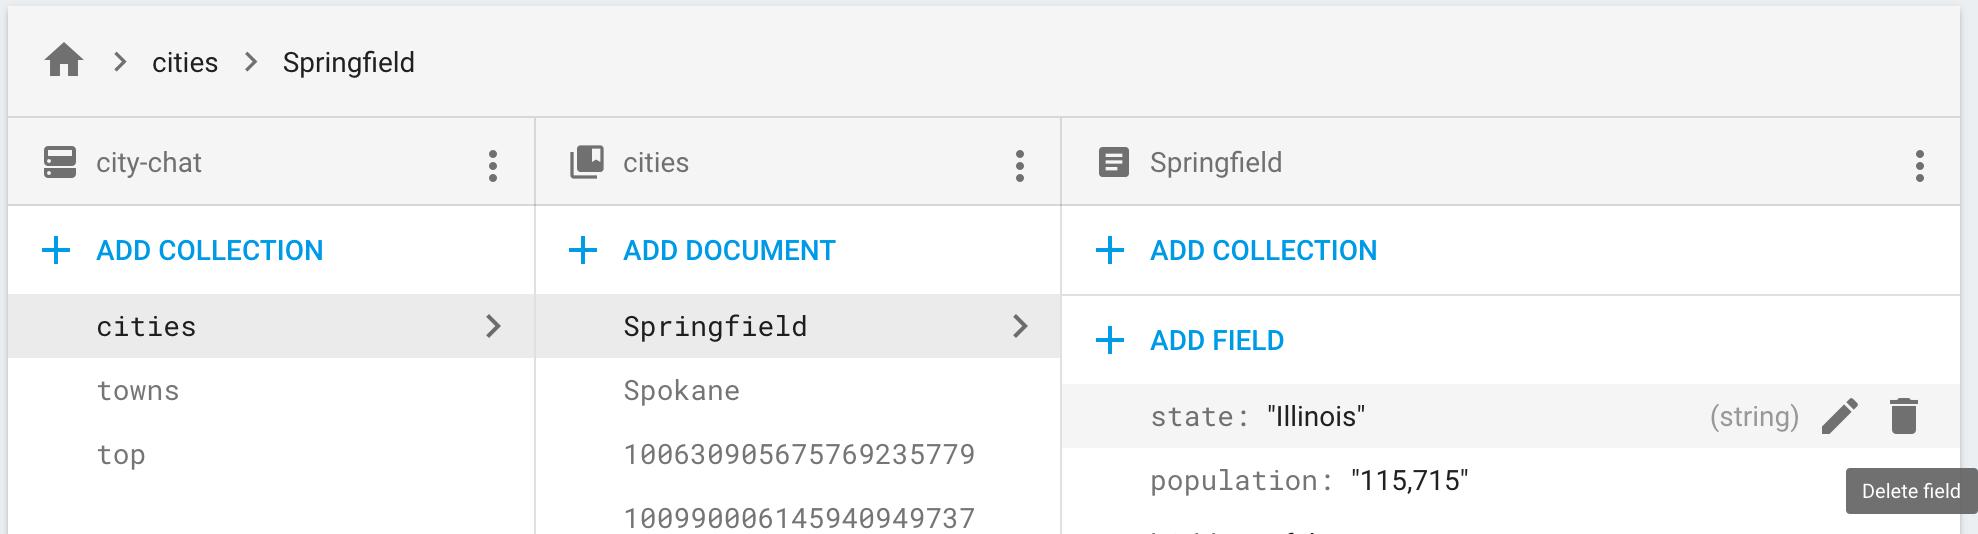 Klik ikon hapus untuk menghapus kolom dari dokumen